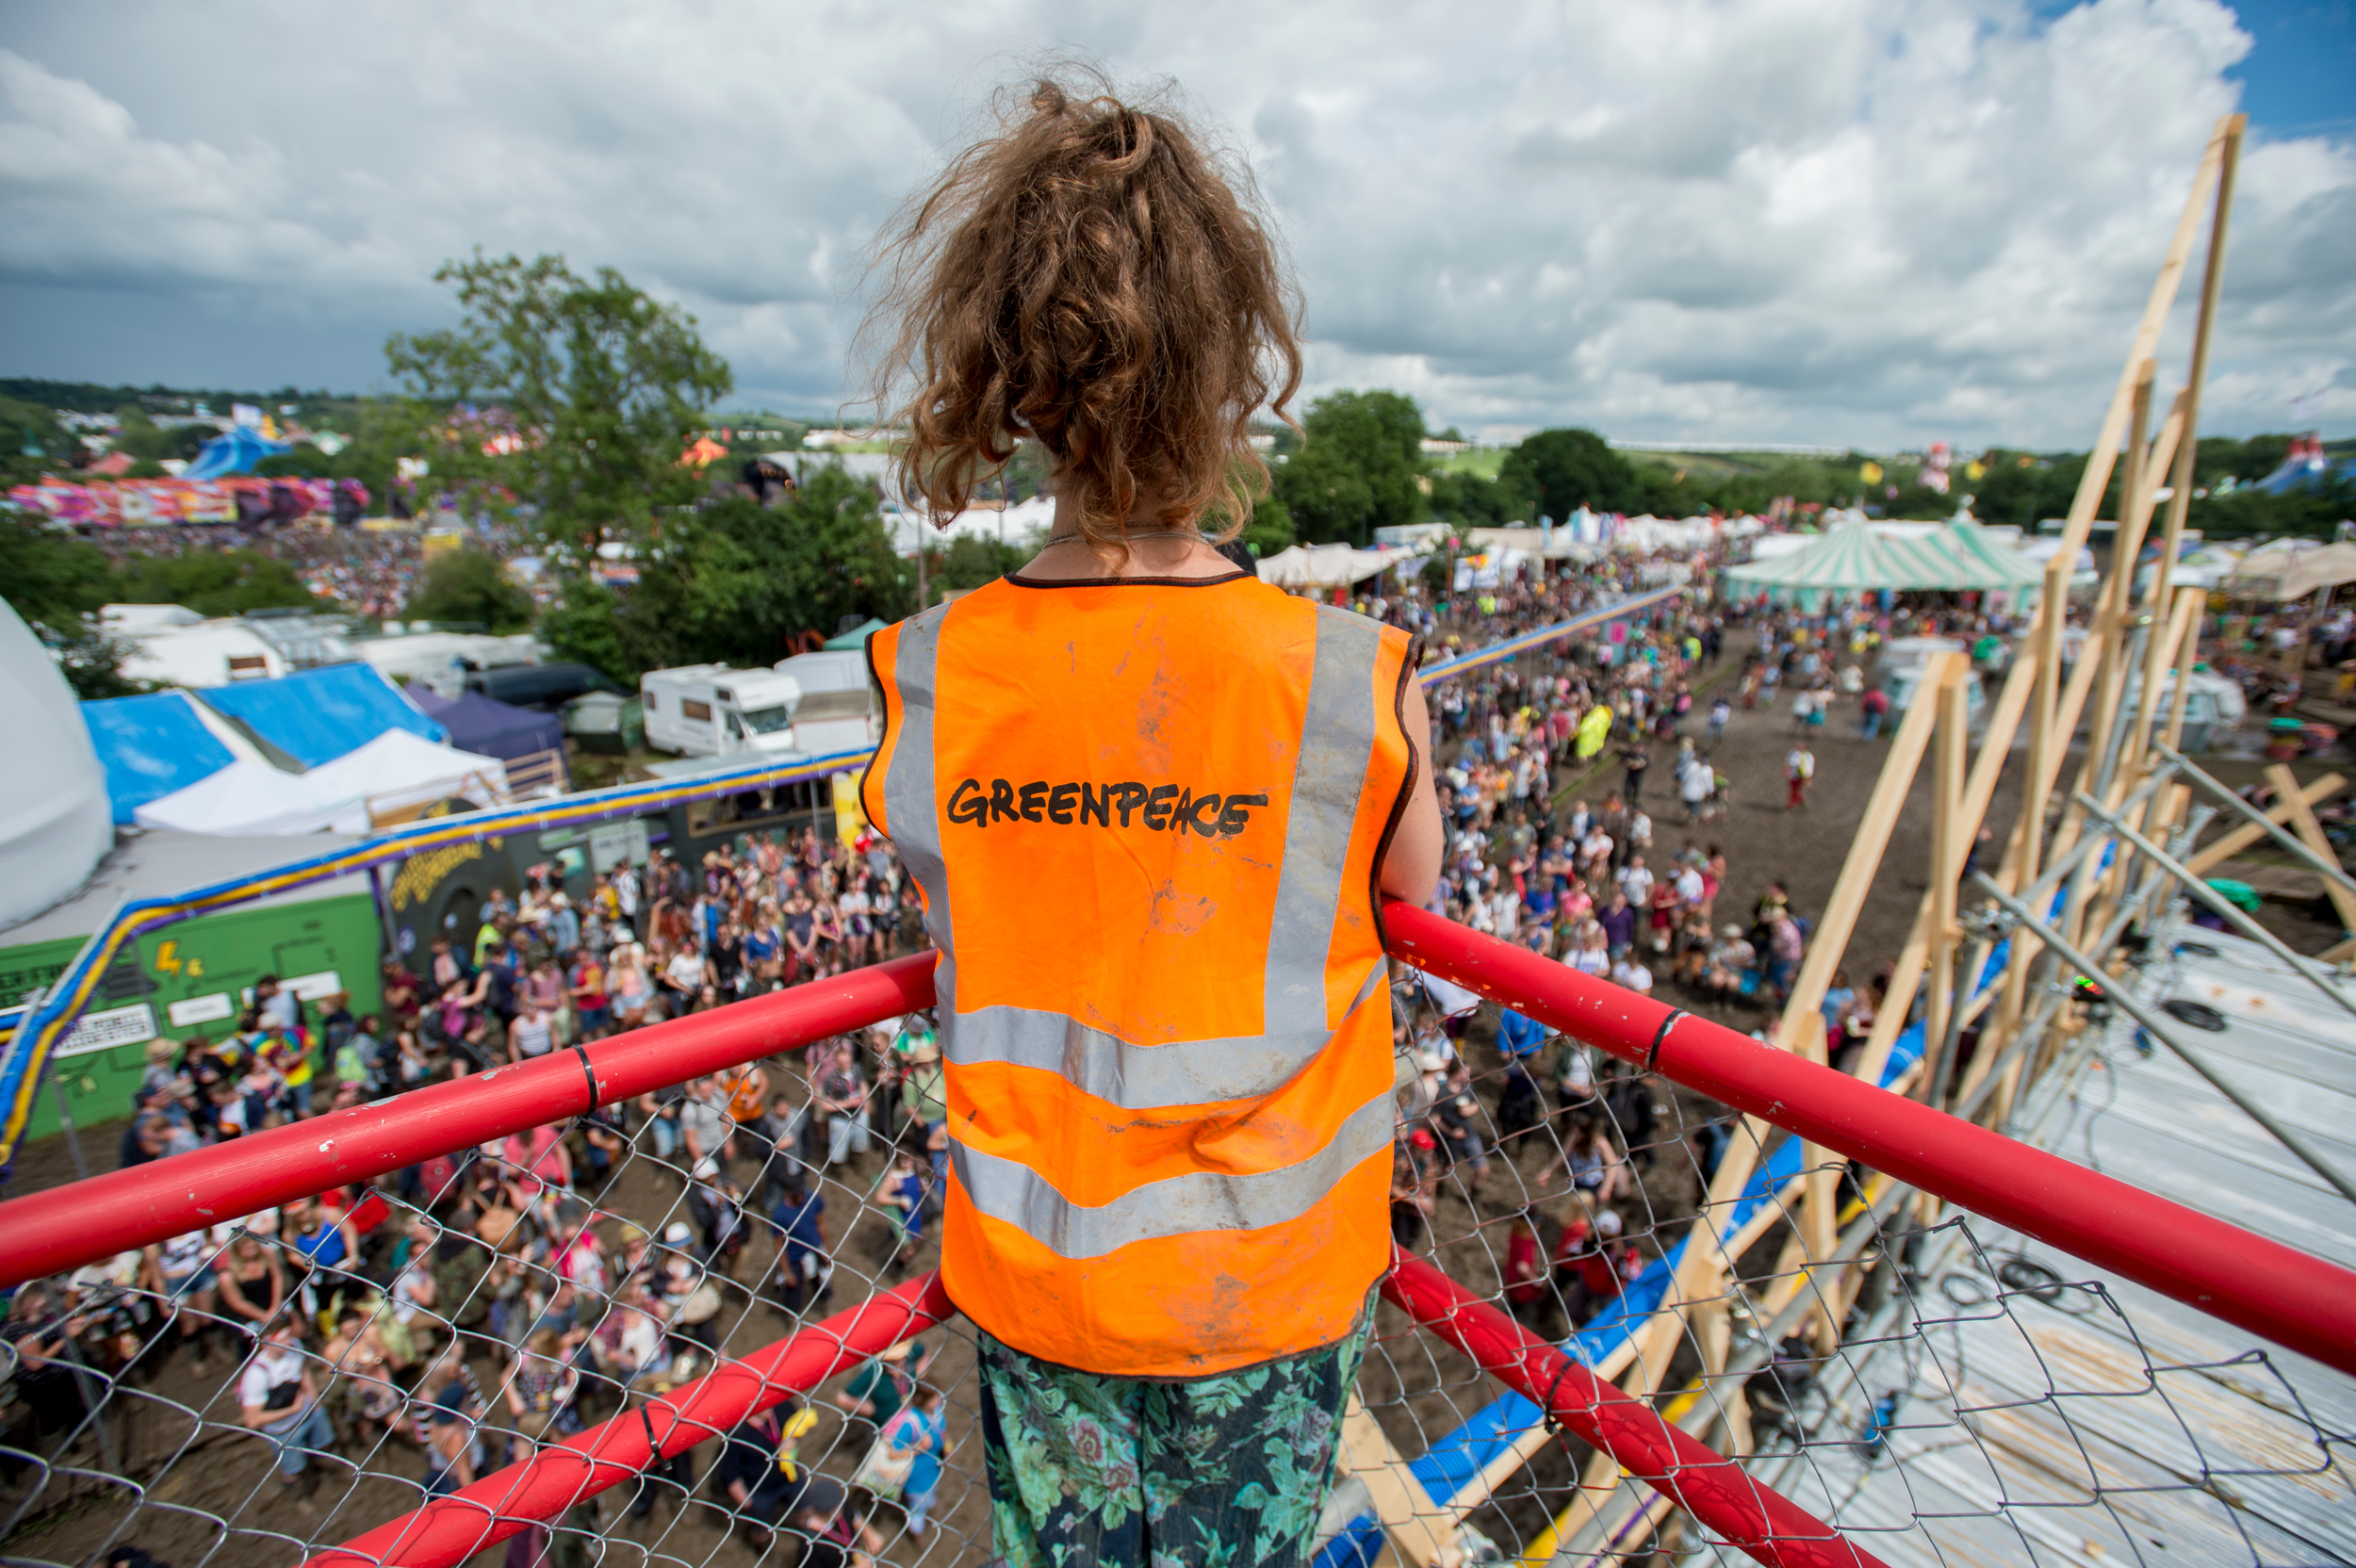 festival volunteer overlooking crowds